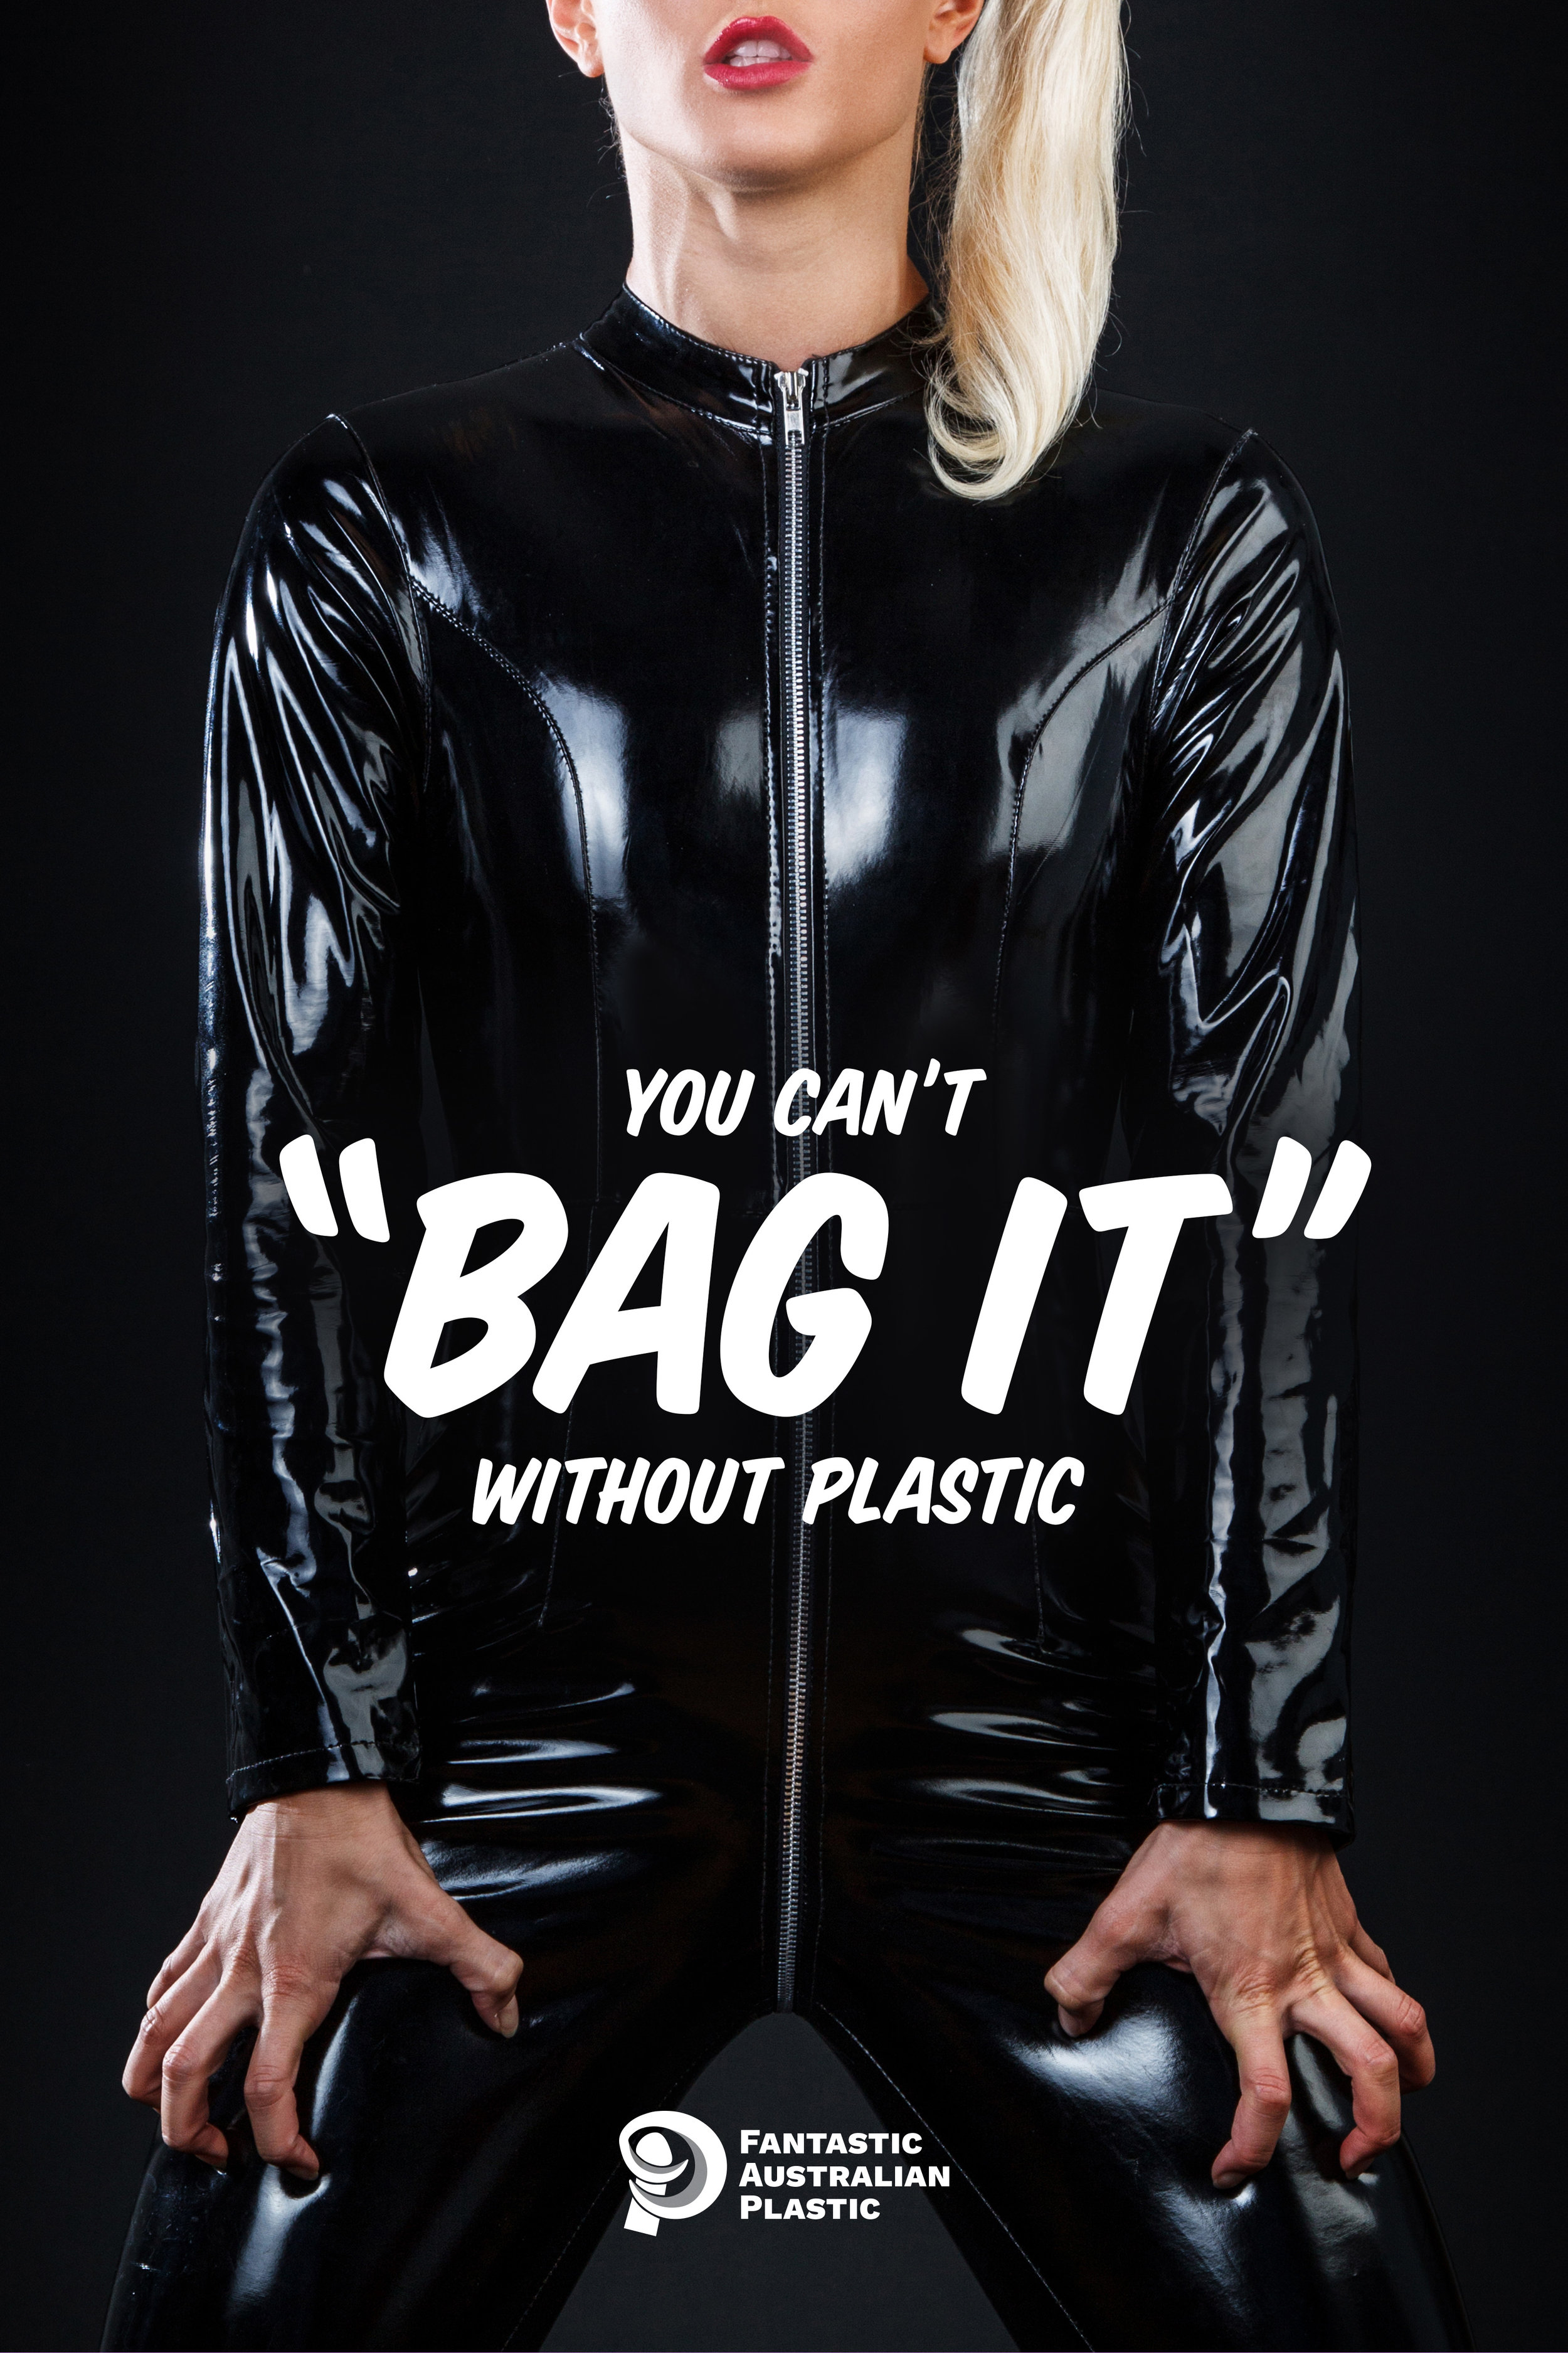 Plastic Bag it 07.jpg